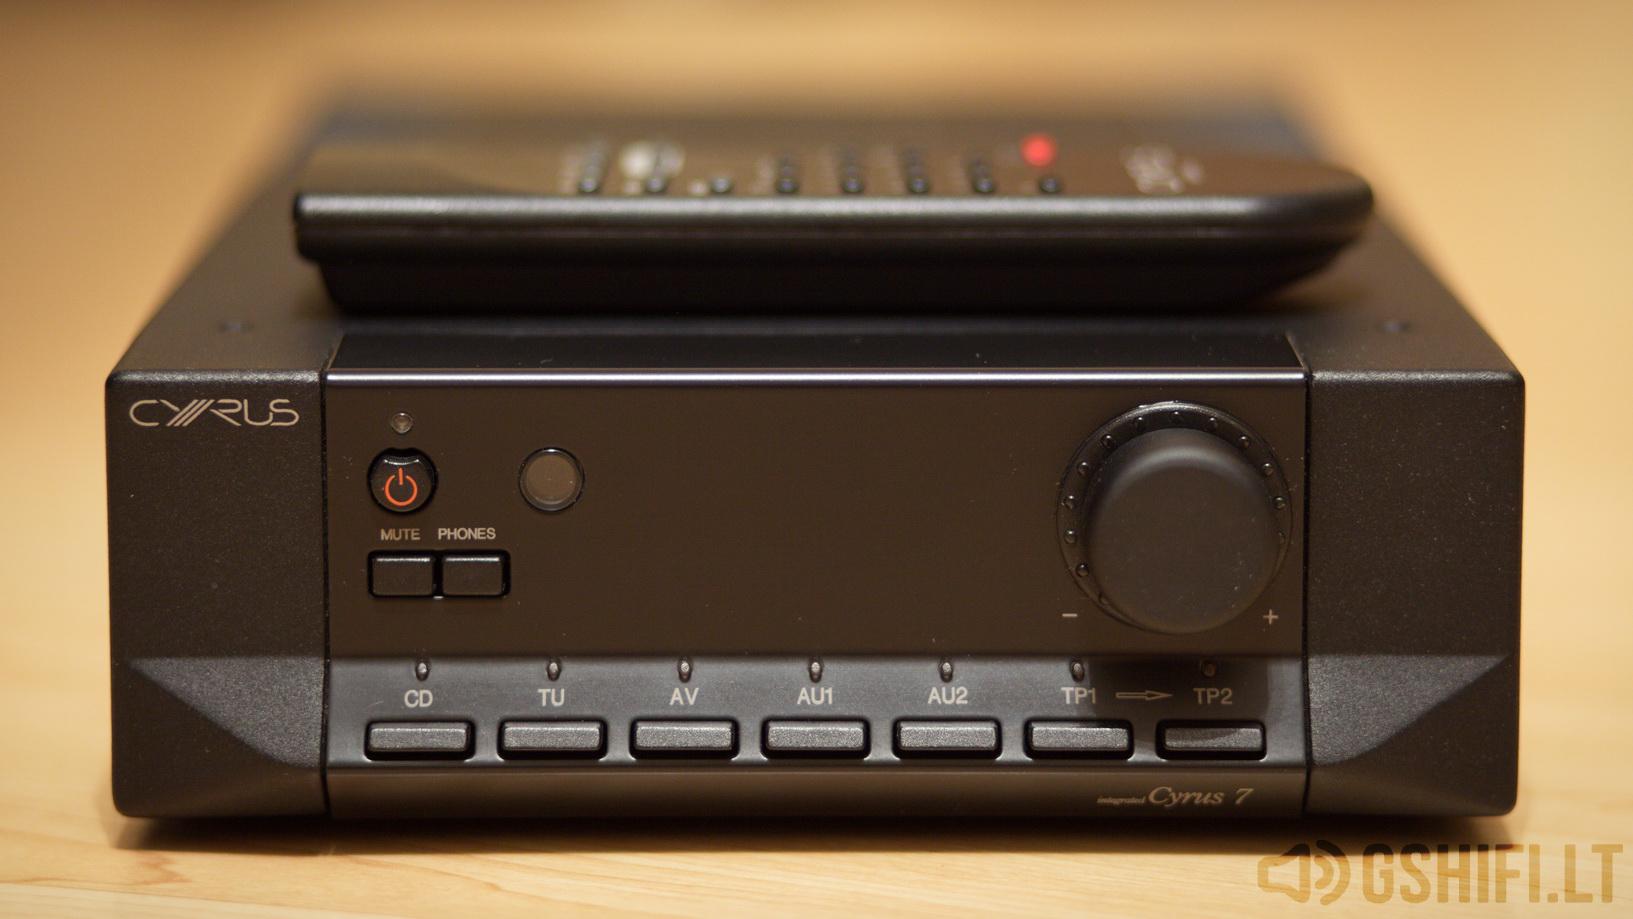 ♪♫Parduotas♫♪ CYRUS 7 Stereo Stiprintuvas | GSHiFi.lt